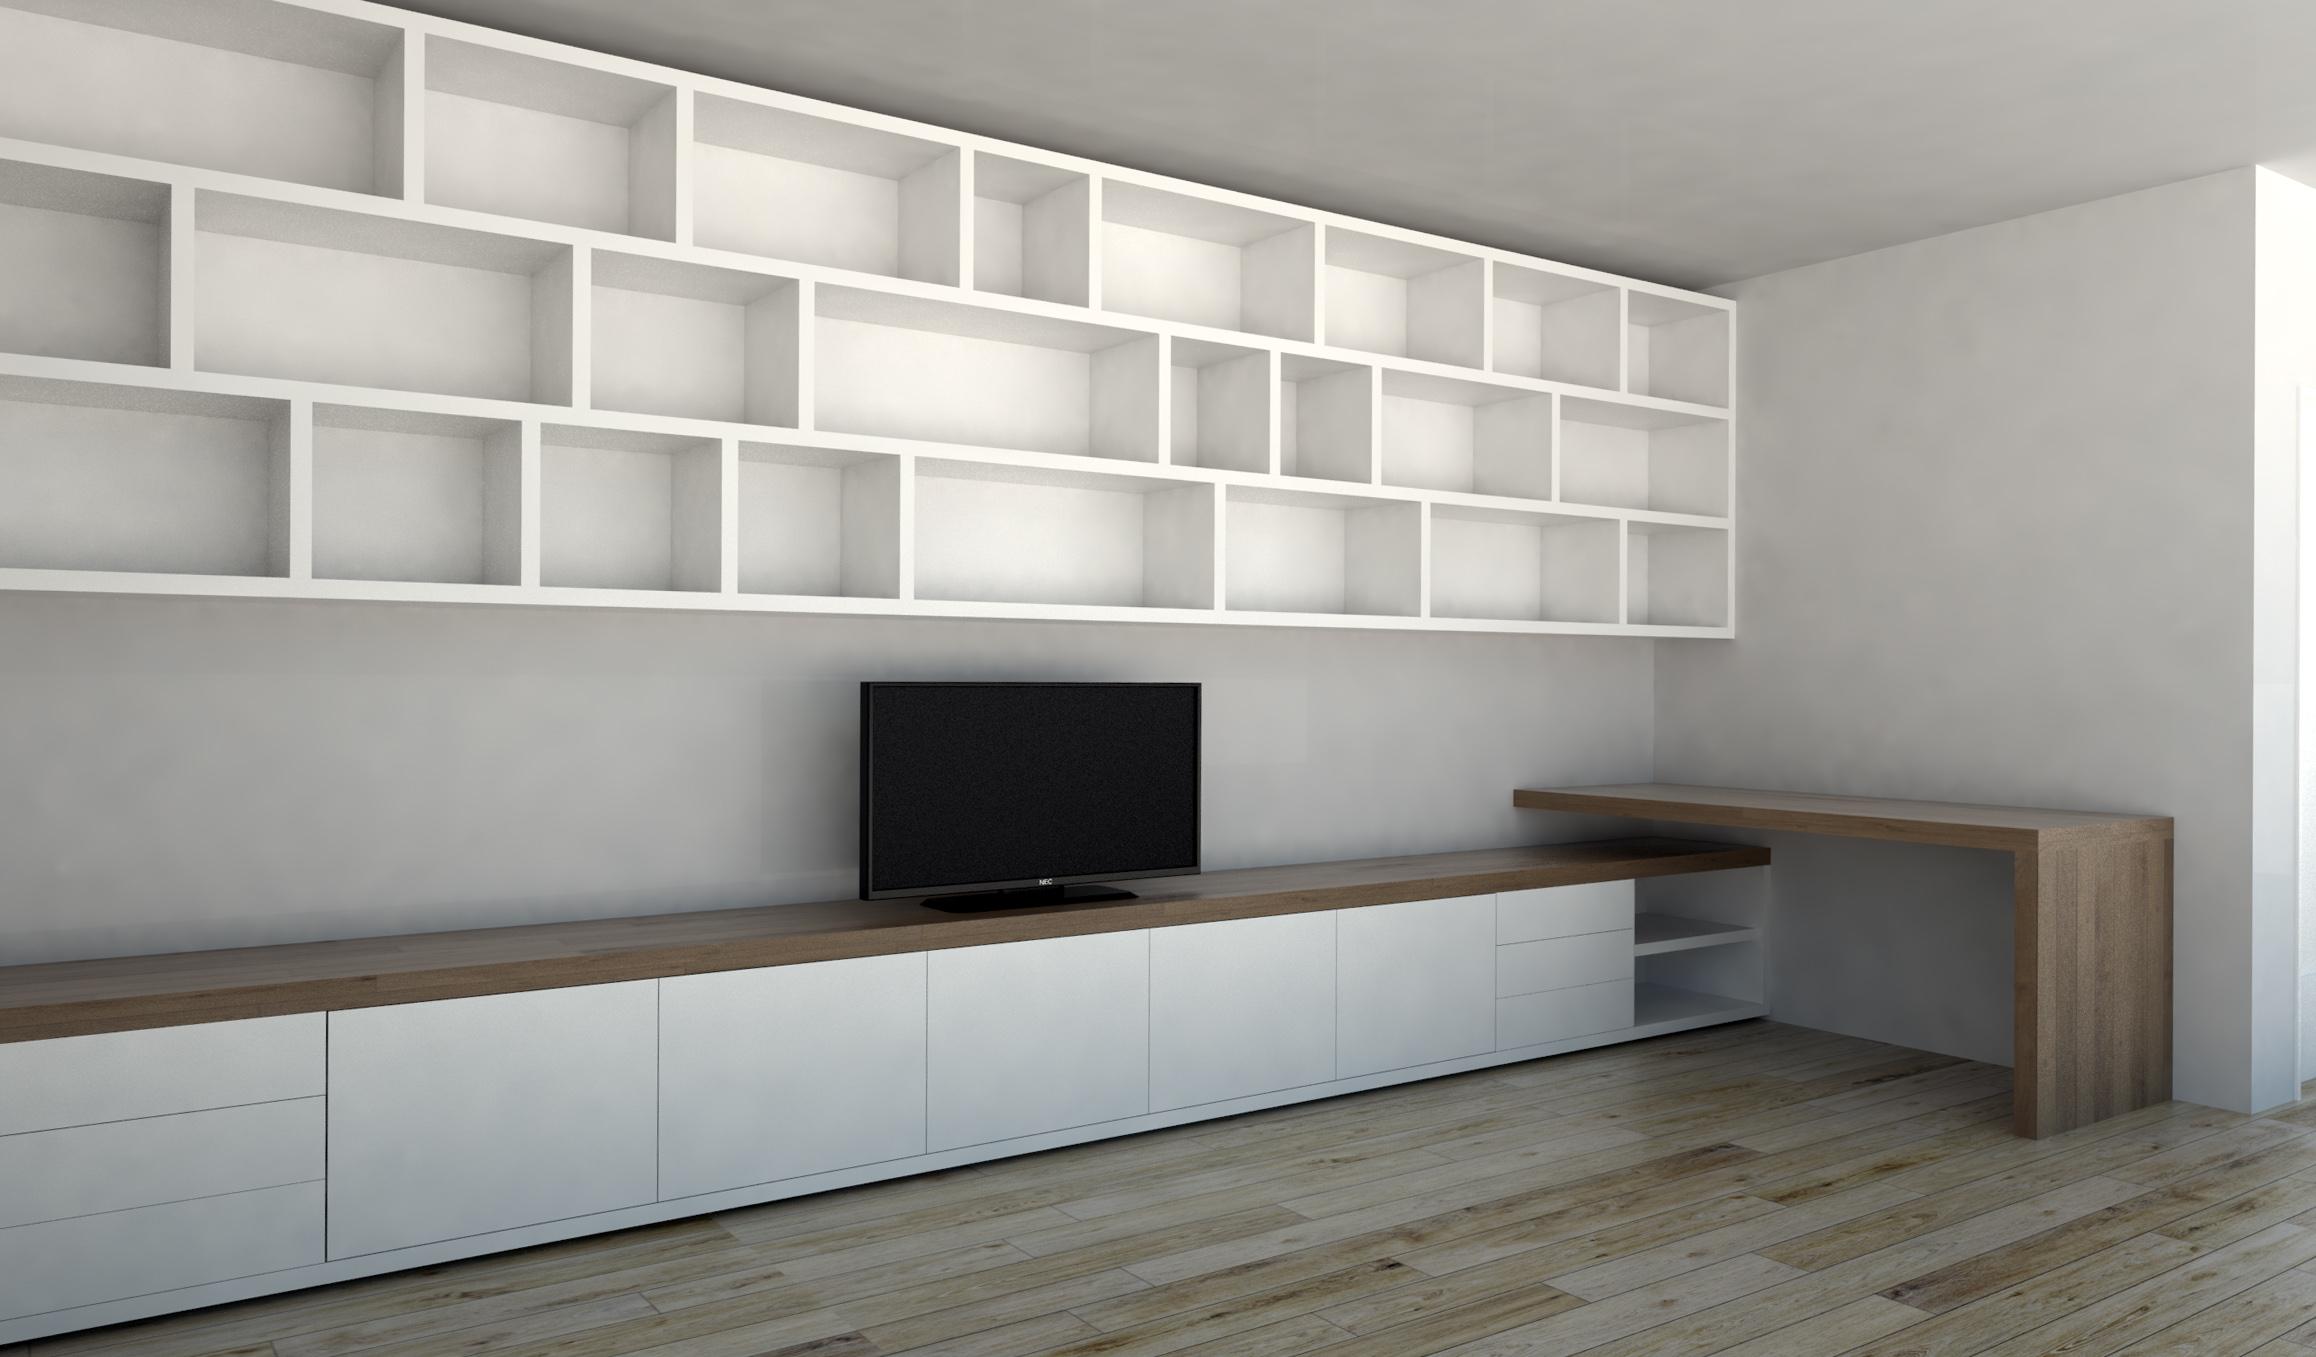 Kasten op maat: Dressoir, boekenkast, TV kast als wandmeubel | Blog NL